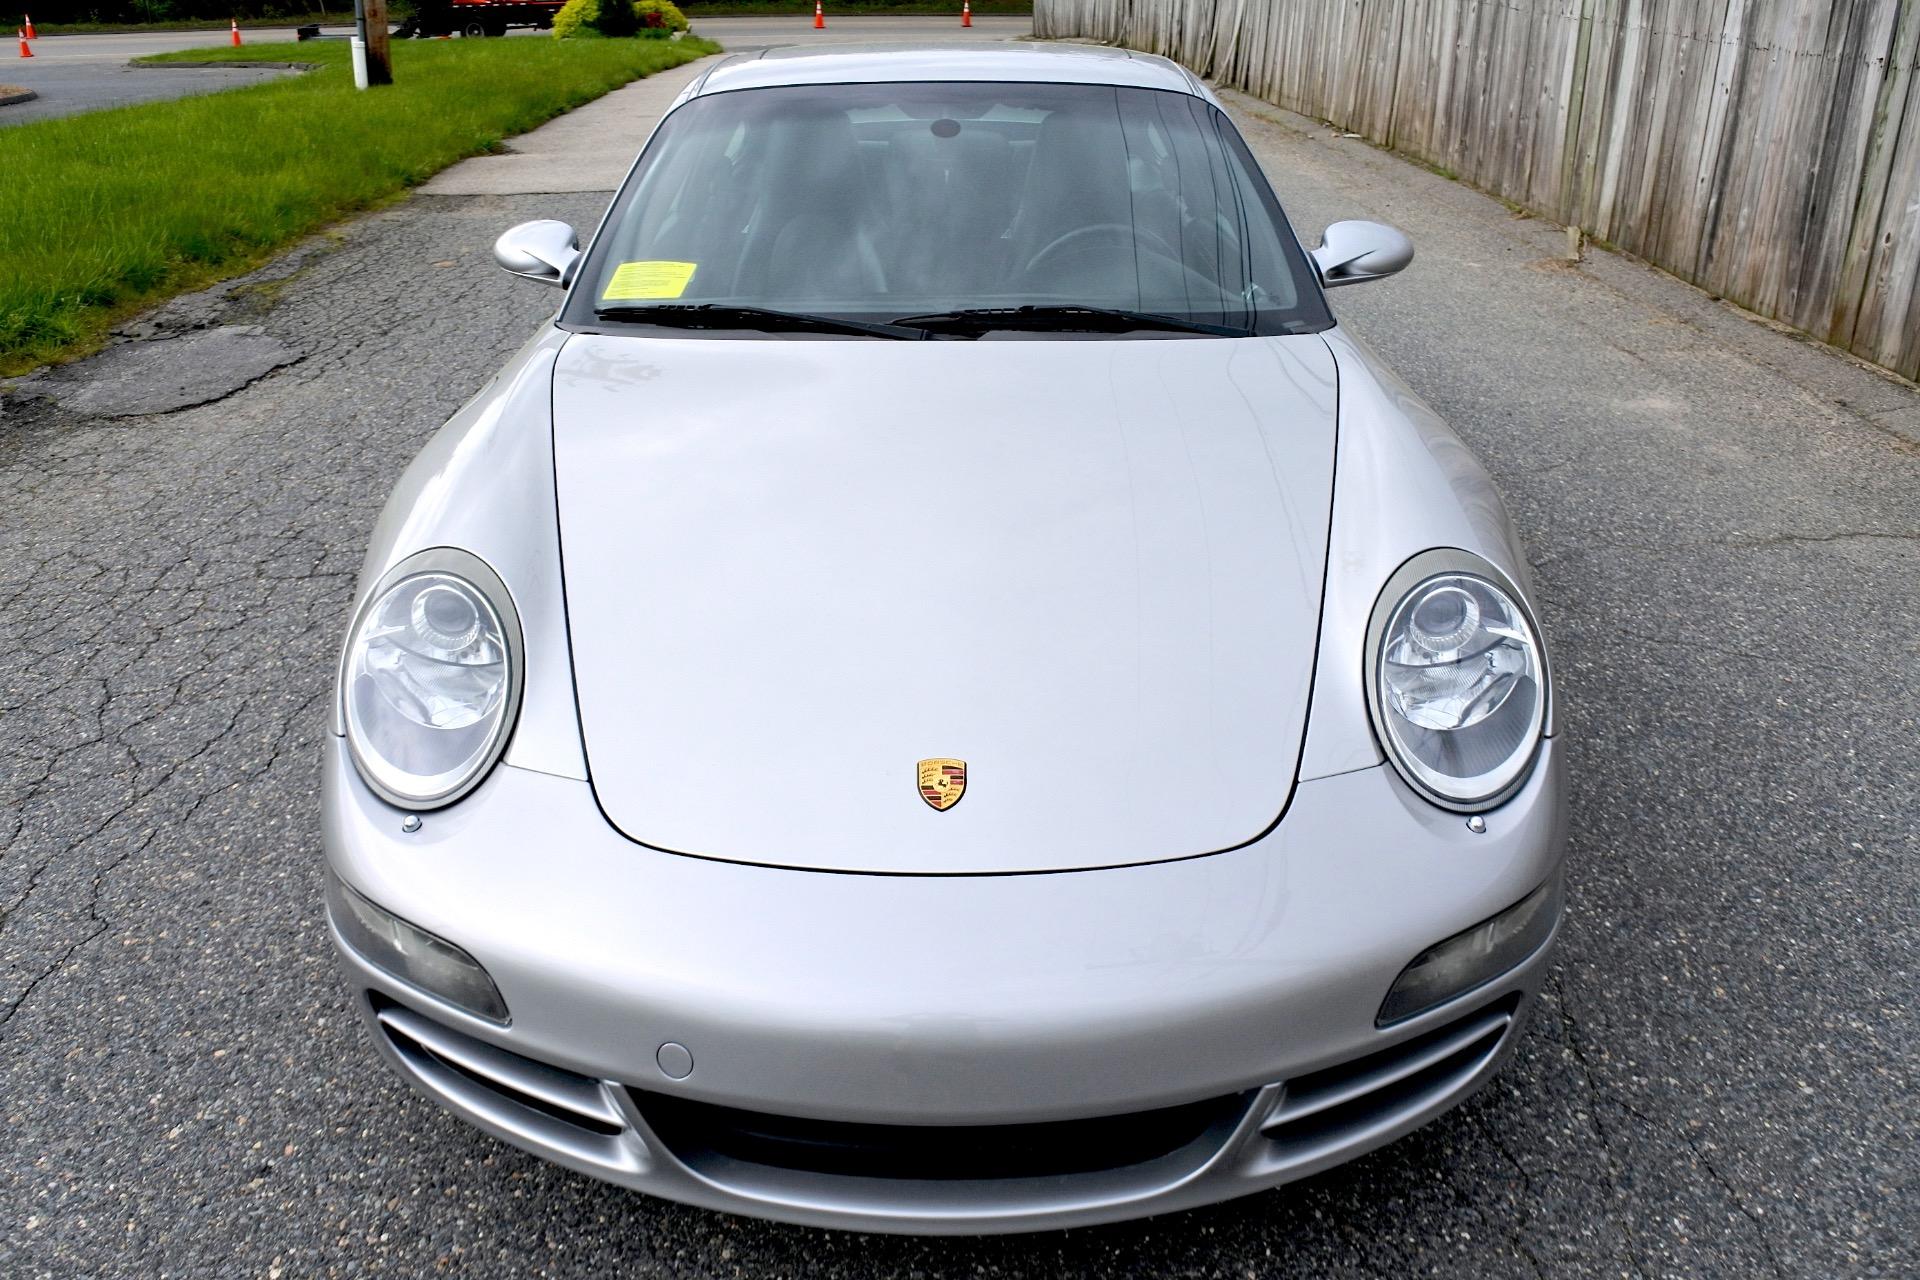 Used 2006 Porsche 911 Carrera 4 Used 2006 Porsche 911 Carrera 4 for sale  at Metro West Motorcars LLC in Shrewsbury MA 8